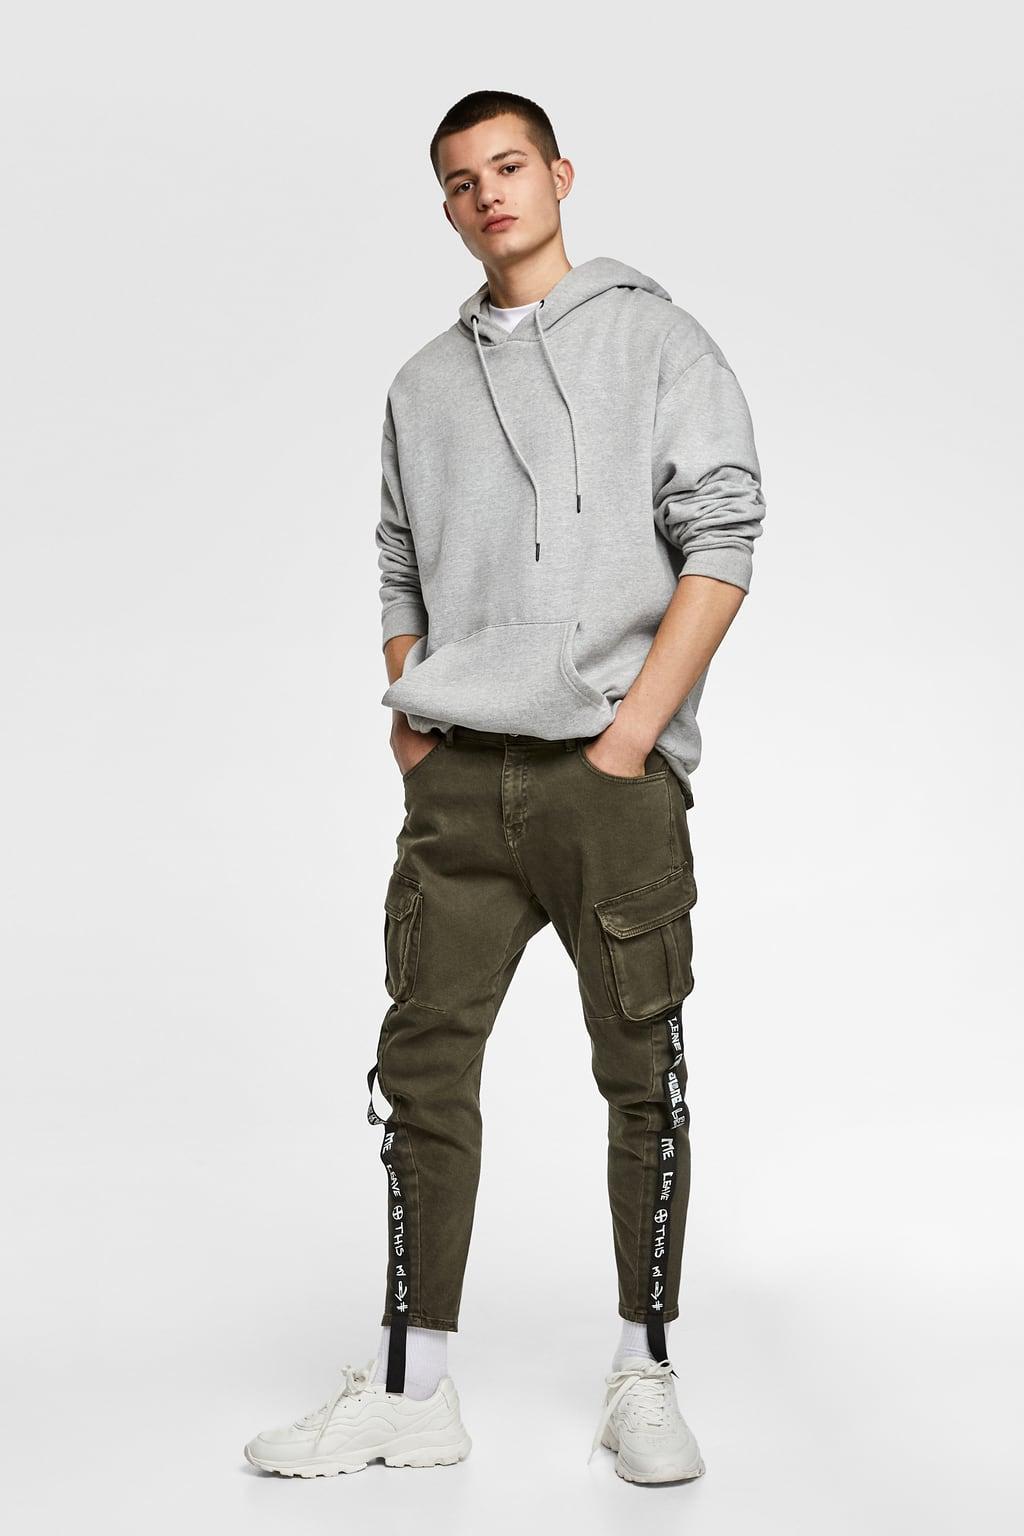 Jeans Cargo Cintas Ver Todo Pantalones Hombre Zara Colombia Cargo Pants Men Cargo Jeans Mens Outfits